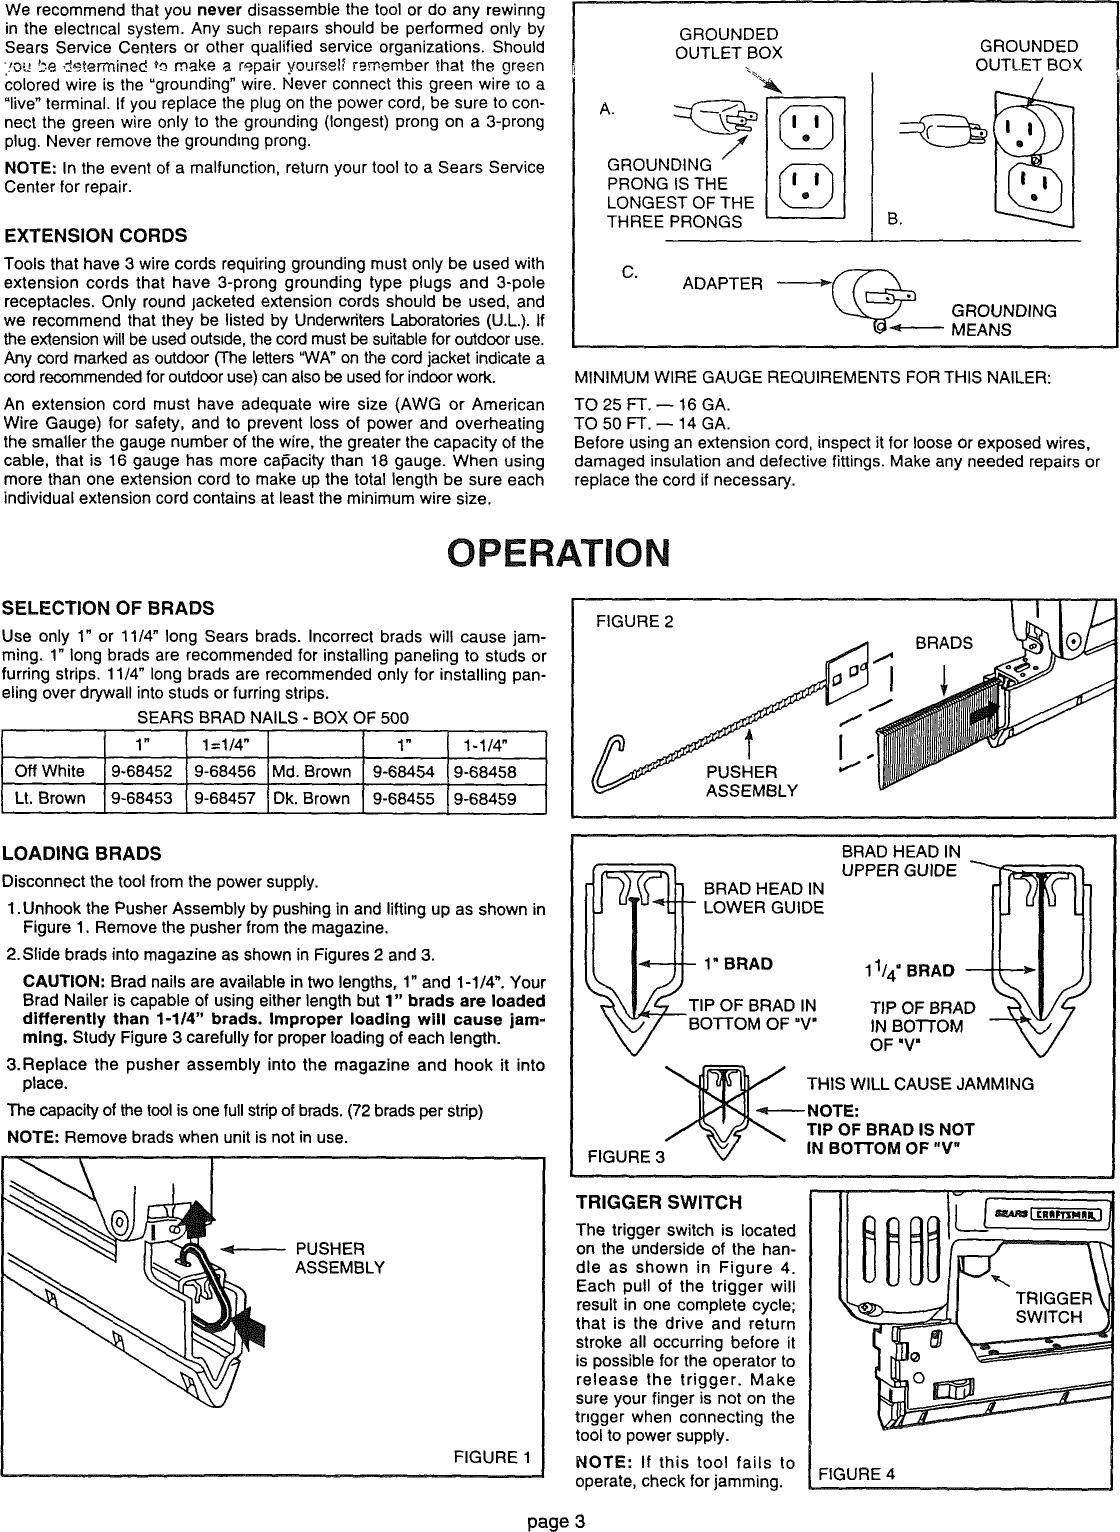 Craftsman electric brad nailer manual